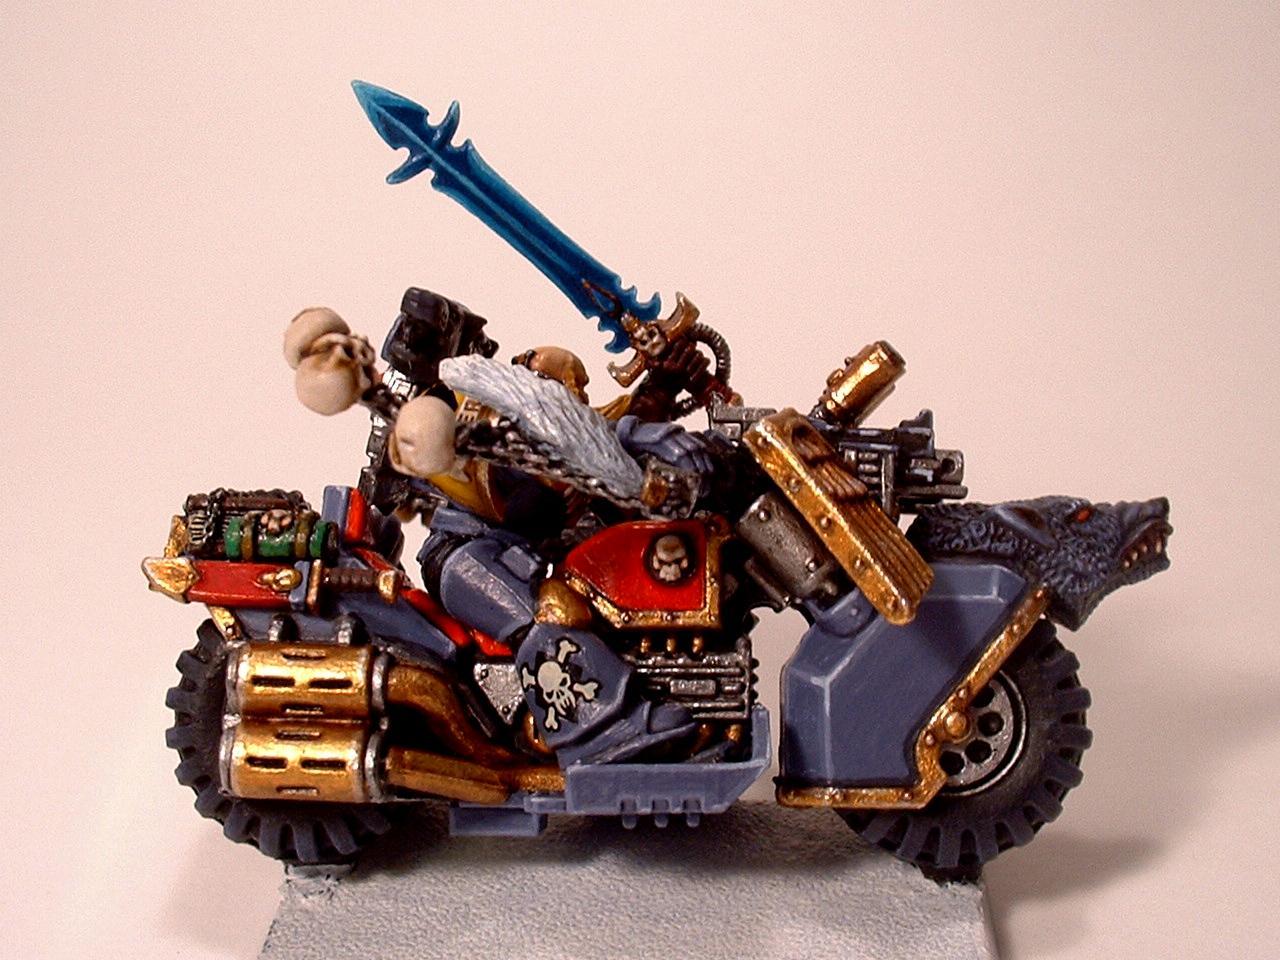 Blood Claw, Space Marine Bike, Space Wolves, Warhammer 40,000, Wolf Guard Battle Leader